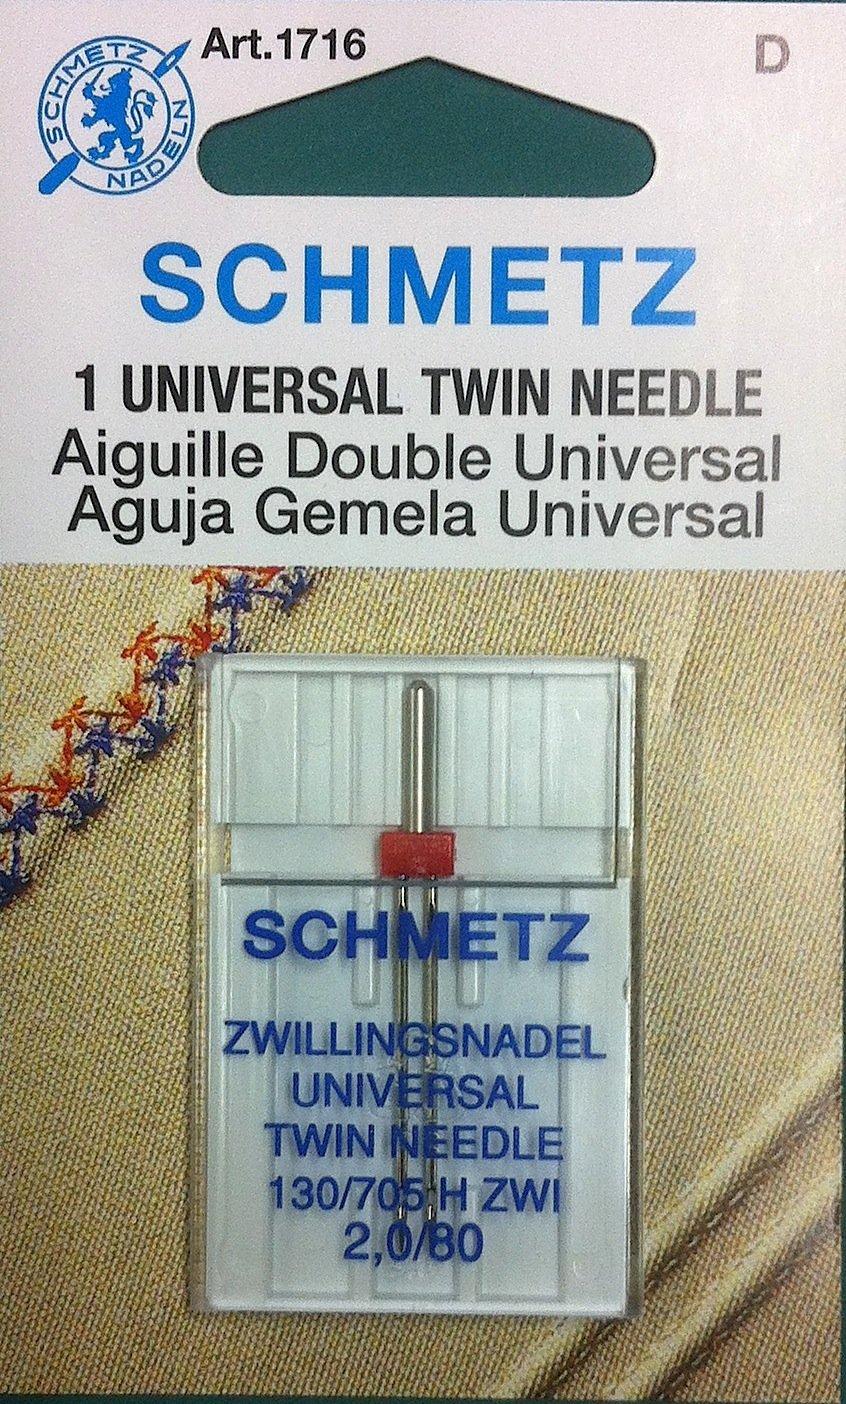 Schmetz Twin Needle 2.0/80